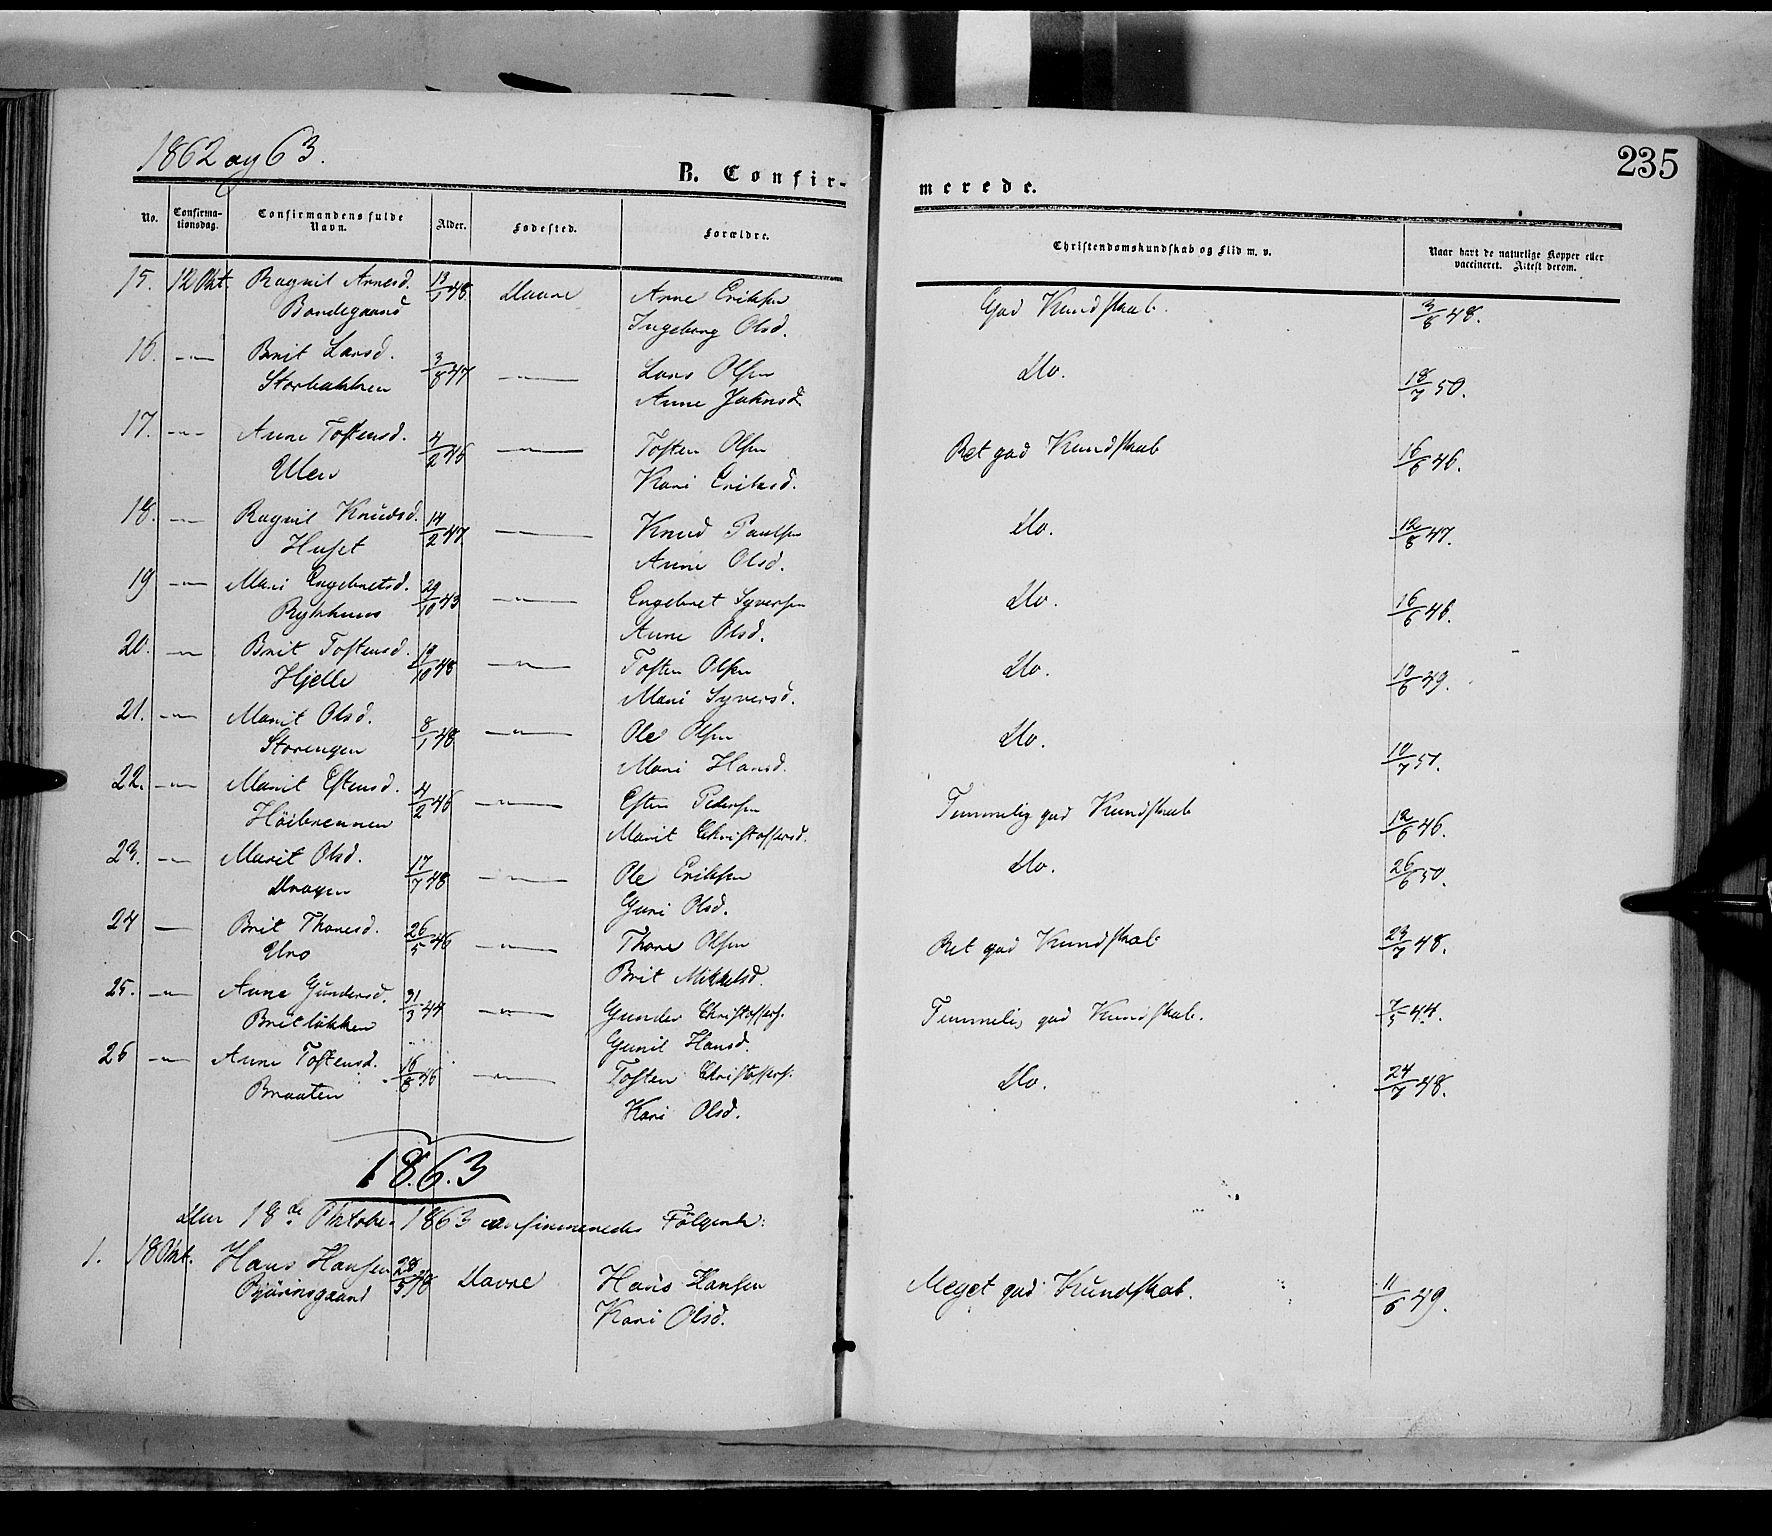 SAH, Dovre prestekontor, Parish register (official) no. 1, 1854-1878, p. 235